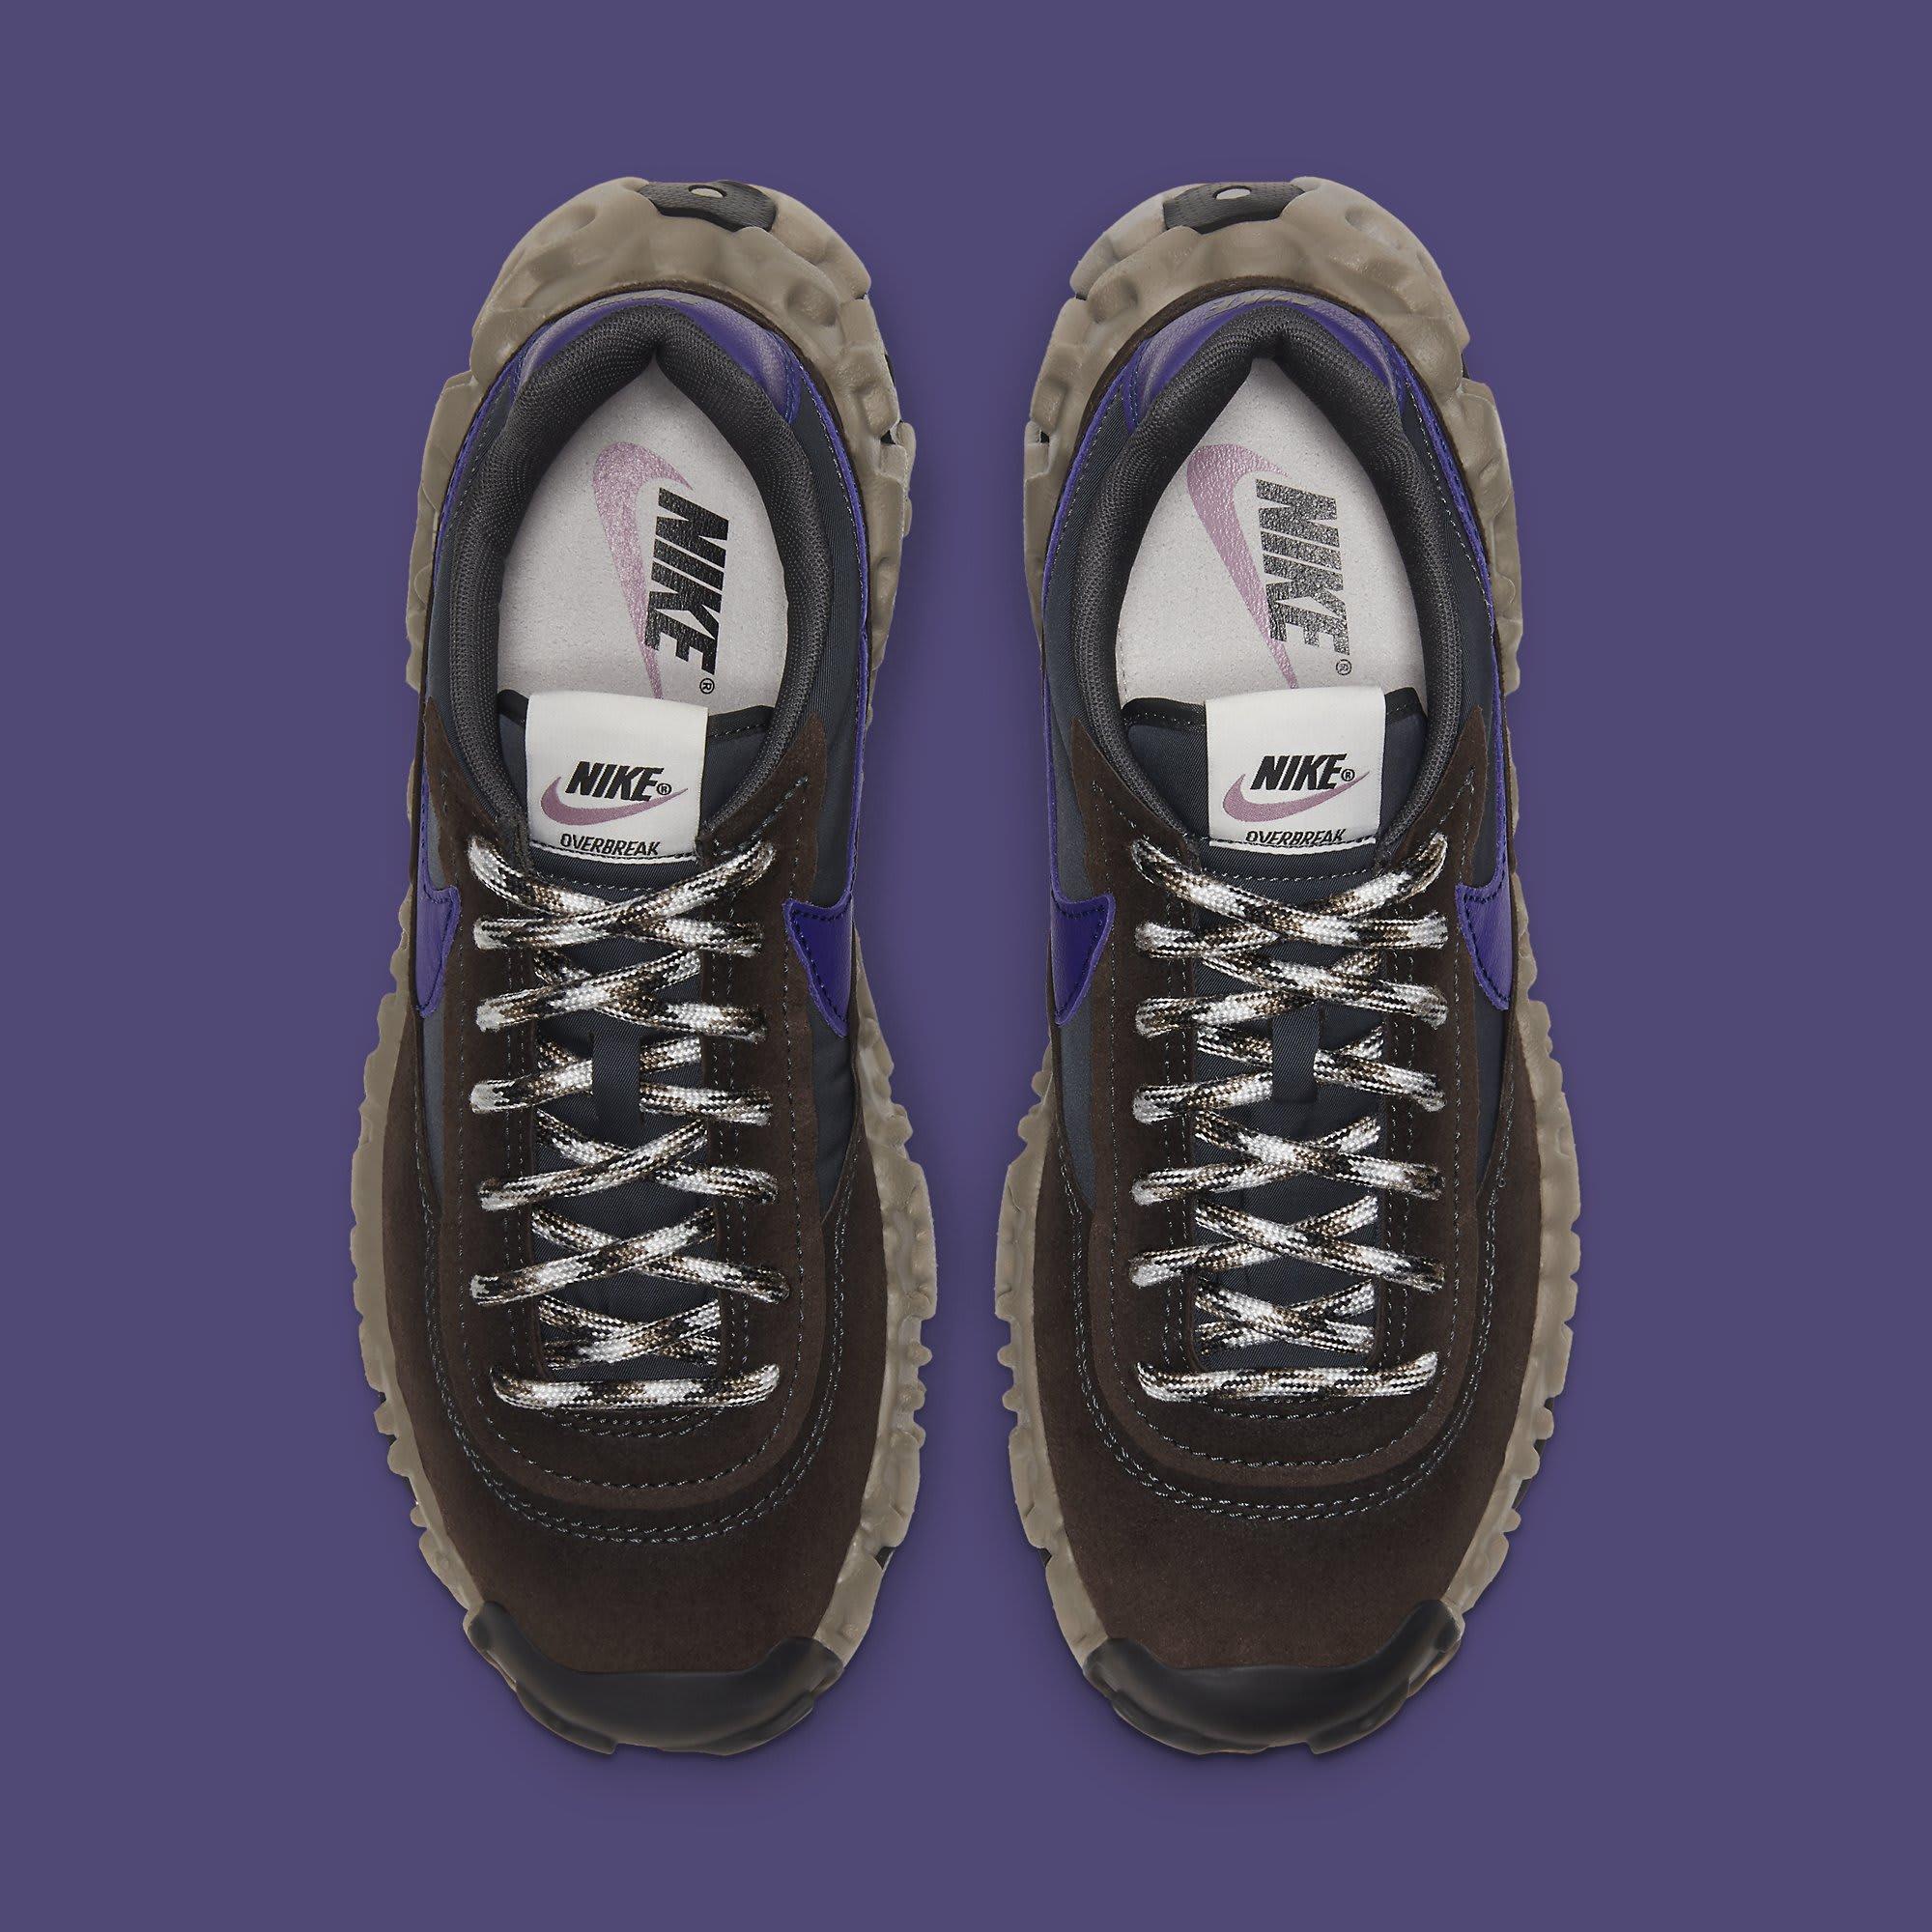 Nike Overbreak 'Baroque Brown' DA9784-200 Top